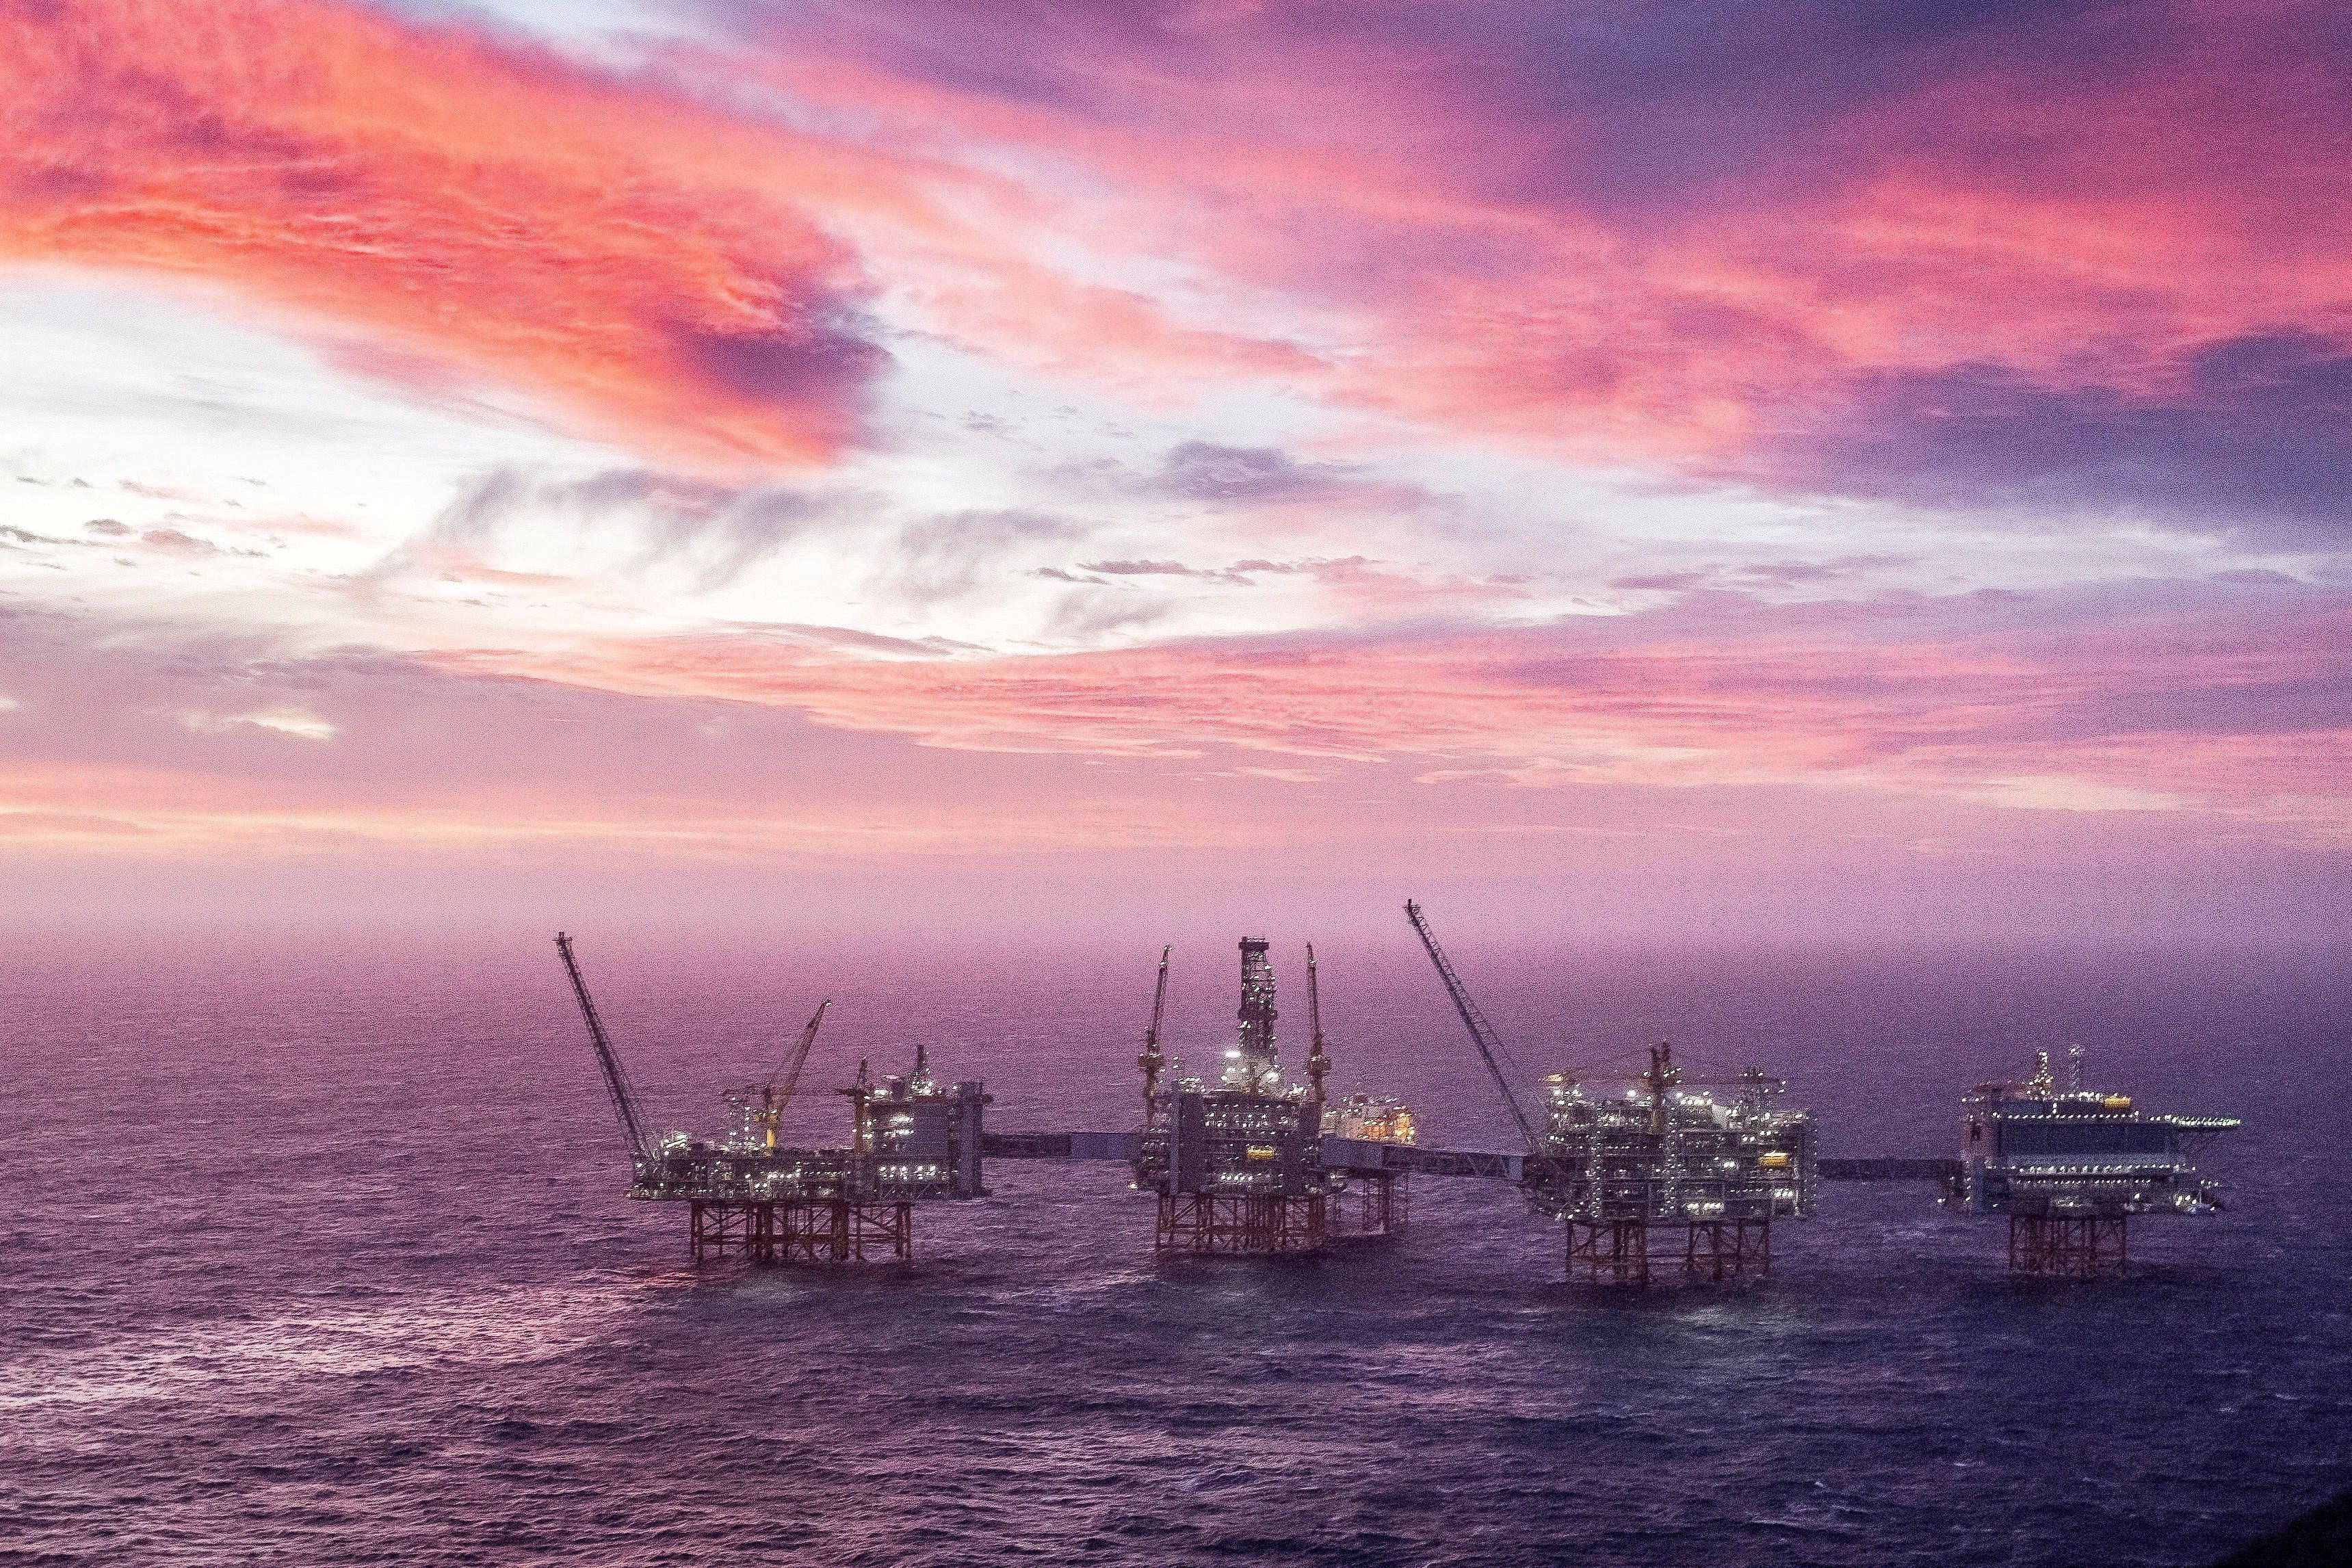 A view of the Johan Sverdrup oilfield in the North Sea, January 7, 2020. Carina Johansen/NTB Scanpix/via REUTERS/File Photo